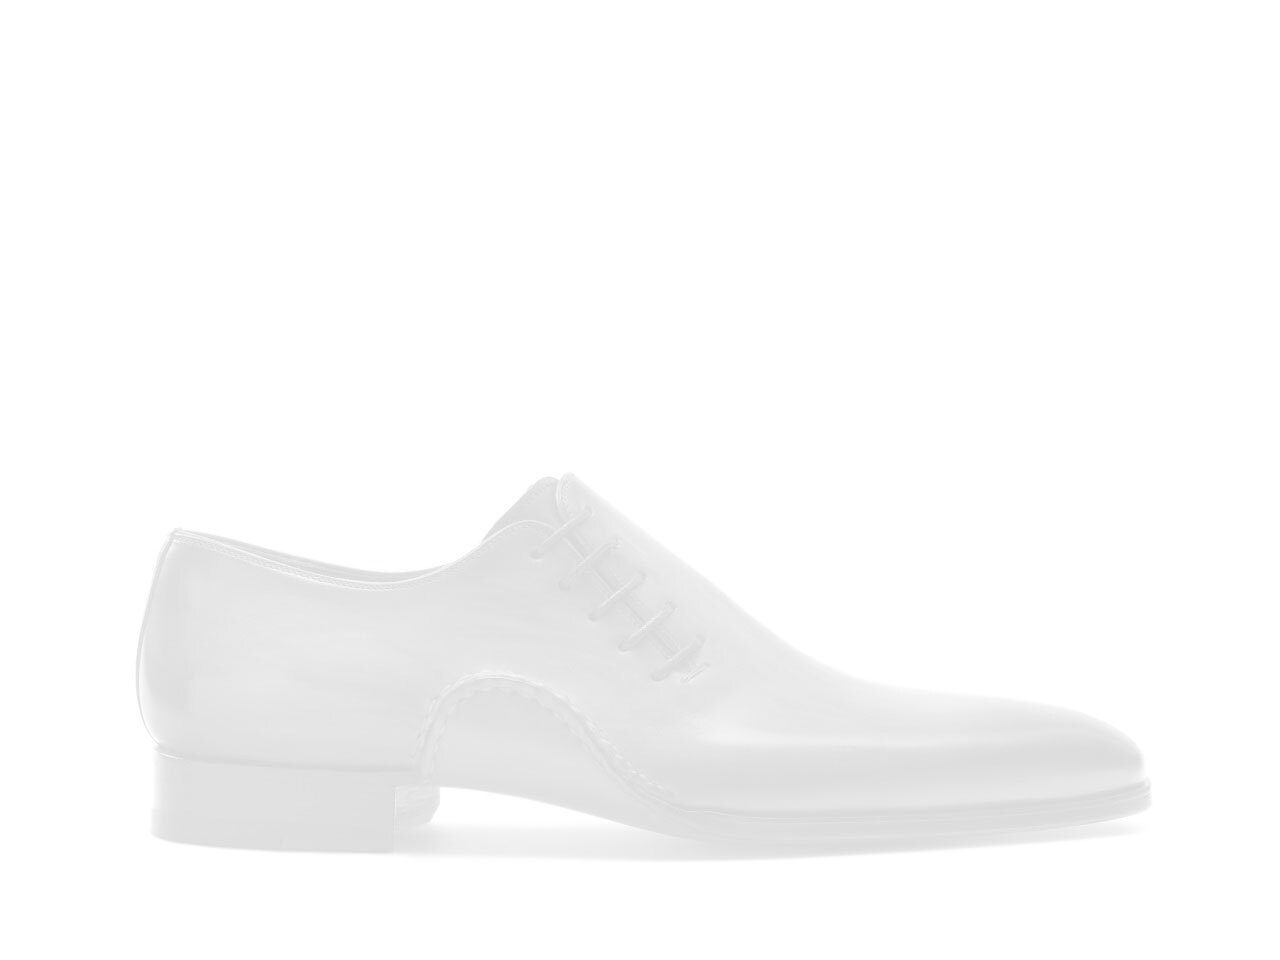 Pair of the Magnanni Utrera Hi Navy Men's High Top Sneakers